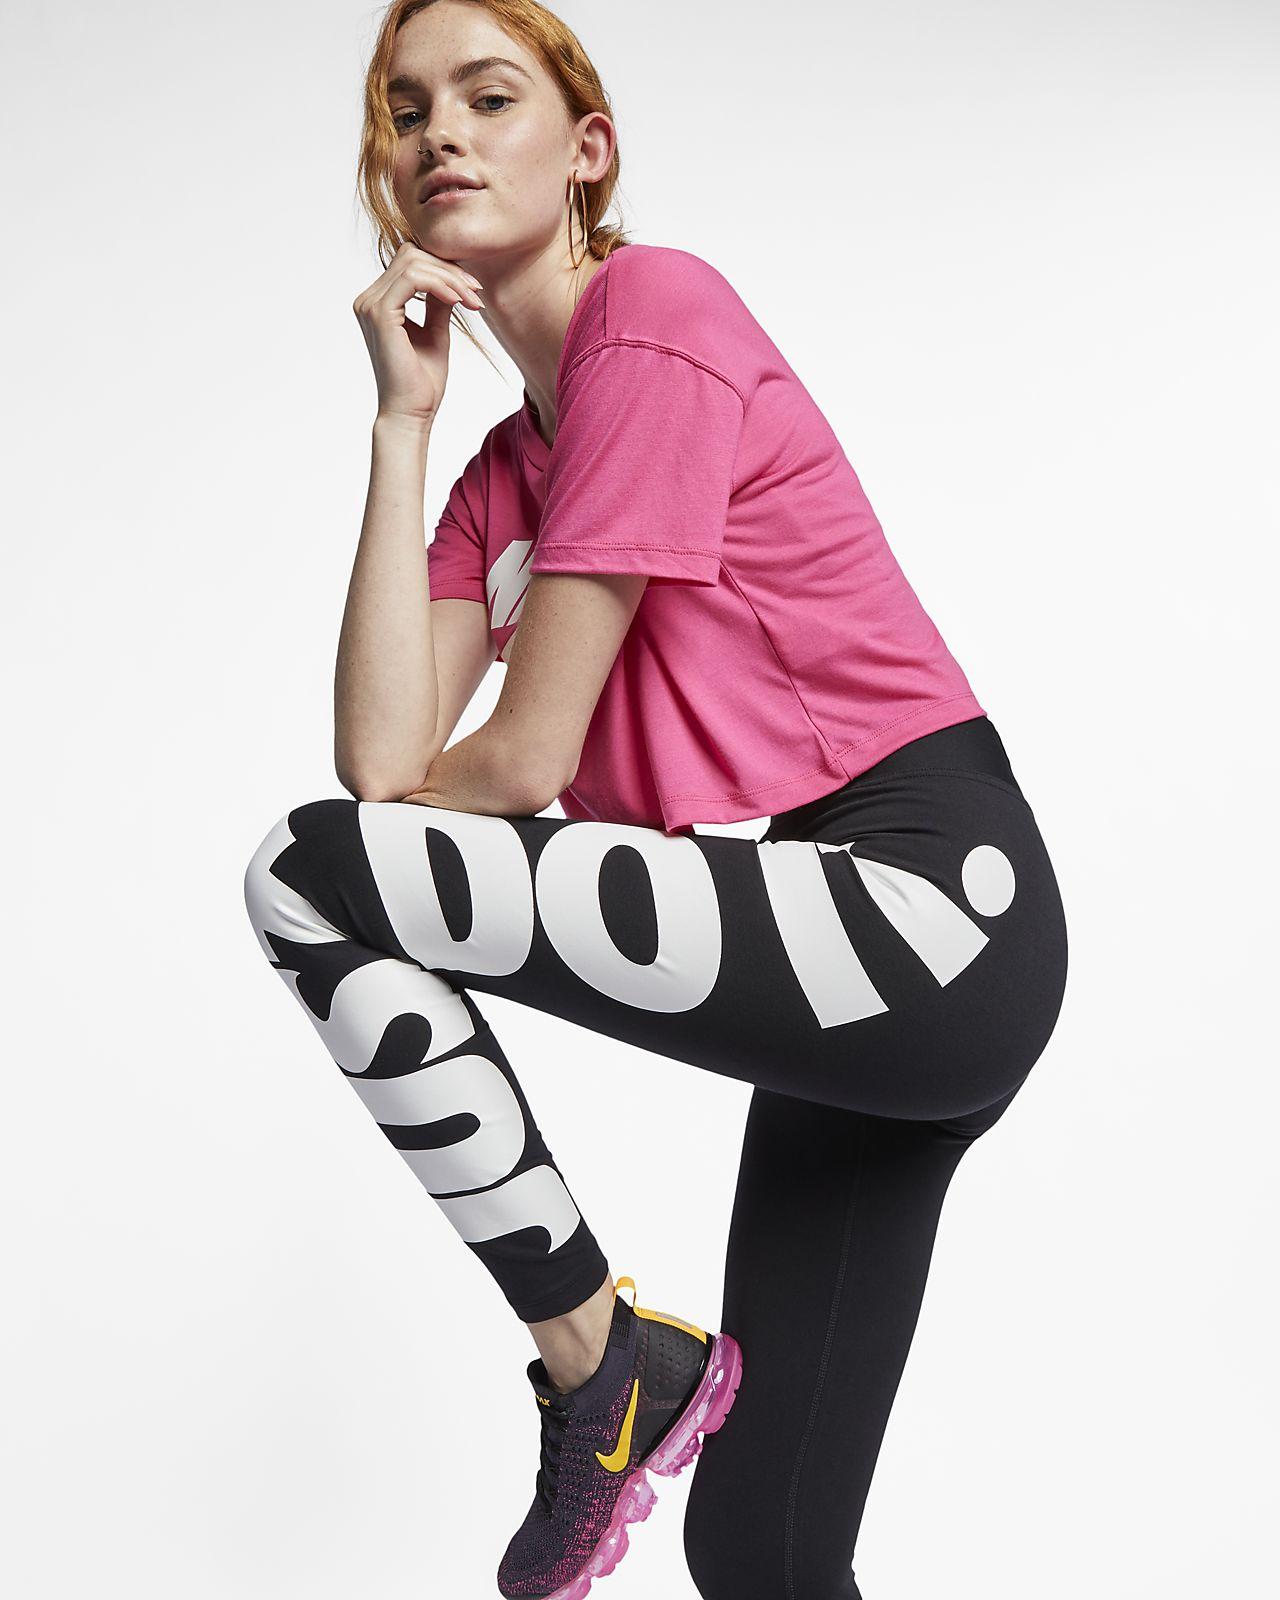 f61869eff5 Nike Sportswear Leg-A-See JDI magas derekú női leggings. Nike.com HU